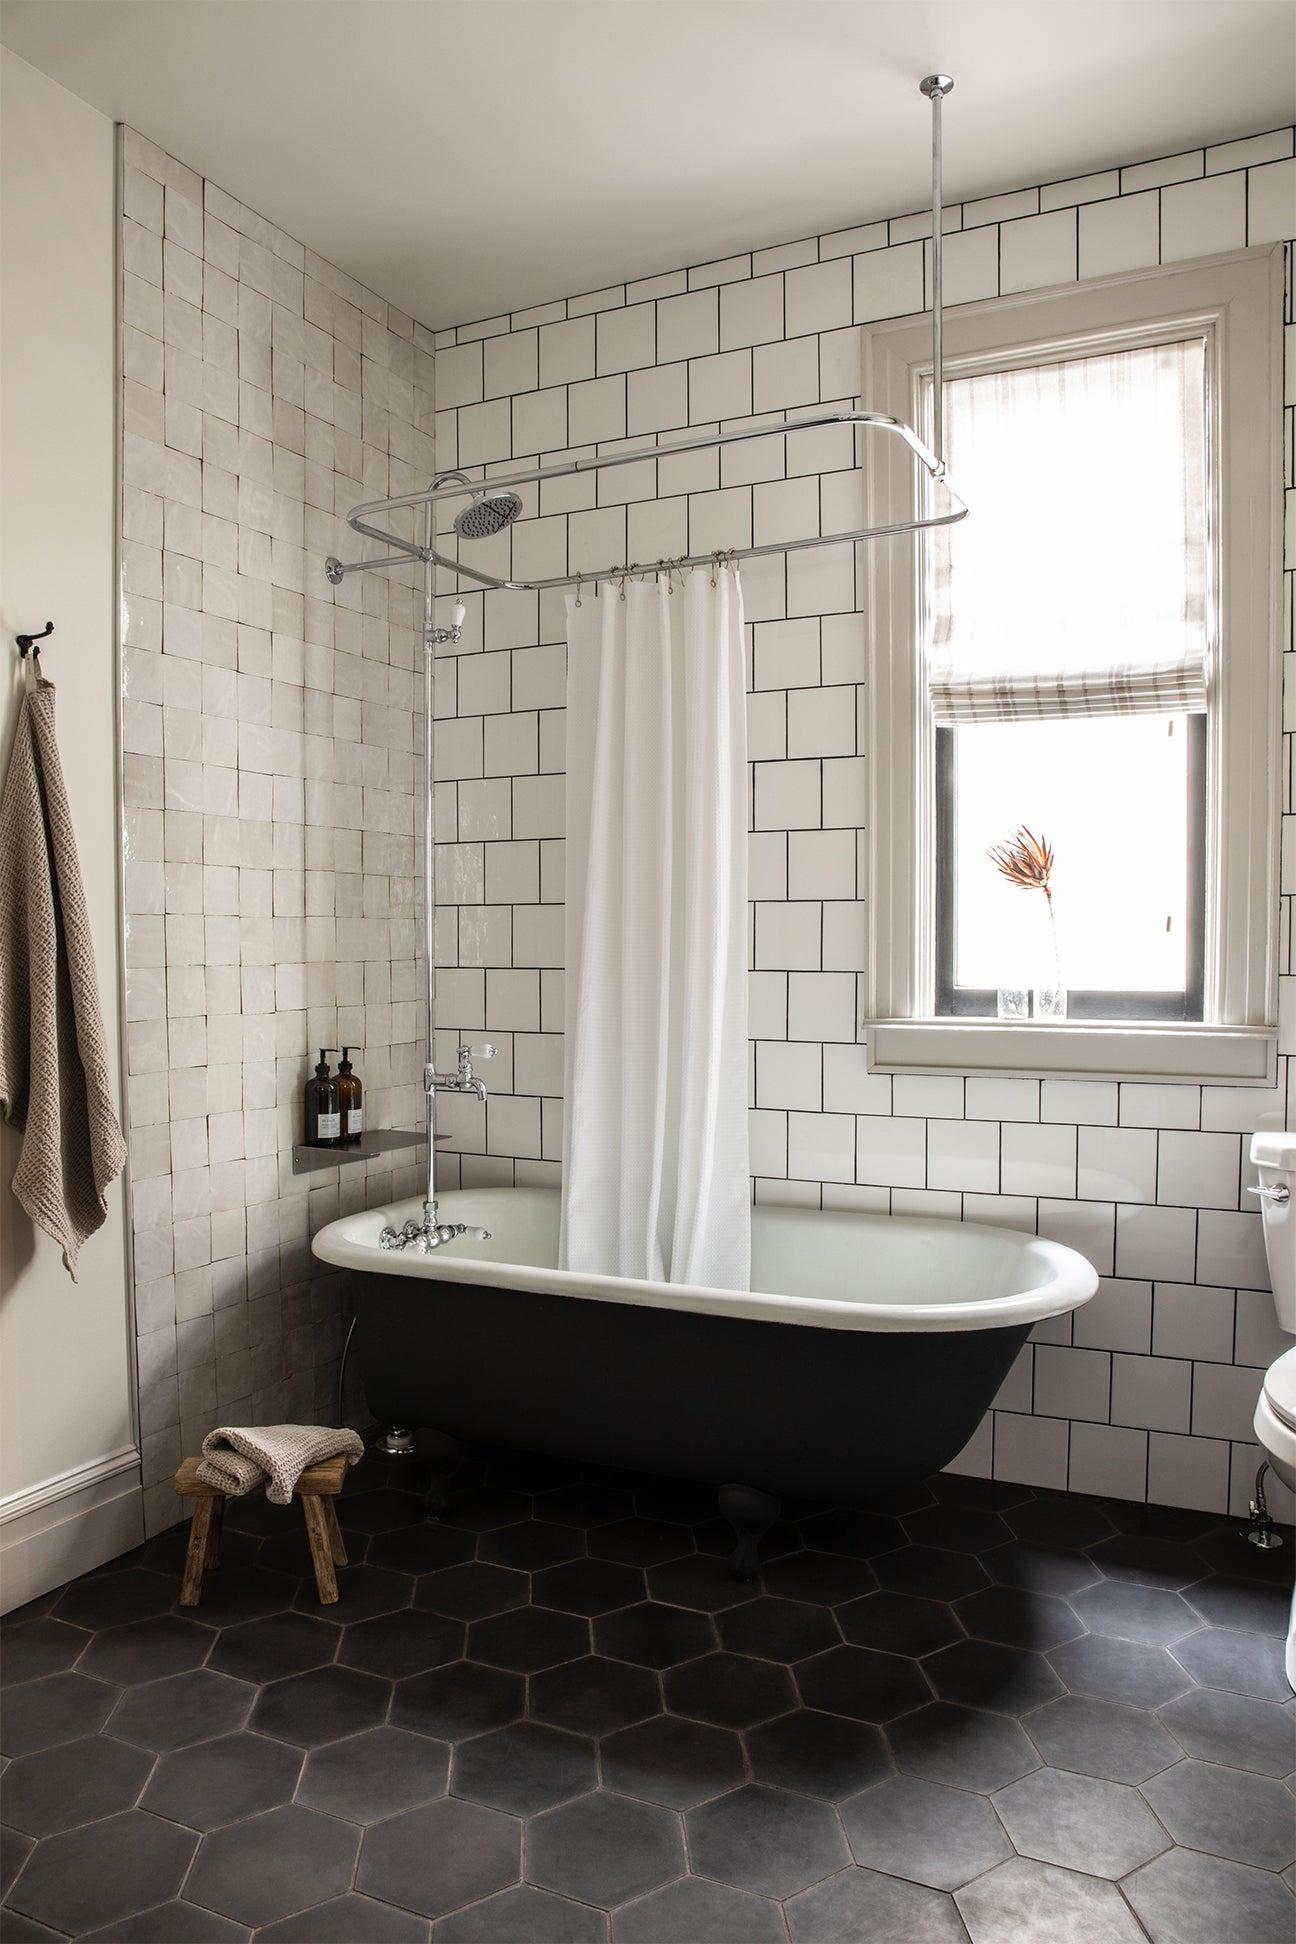 tiled bathroom with claw foot tub